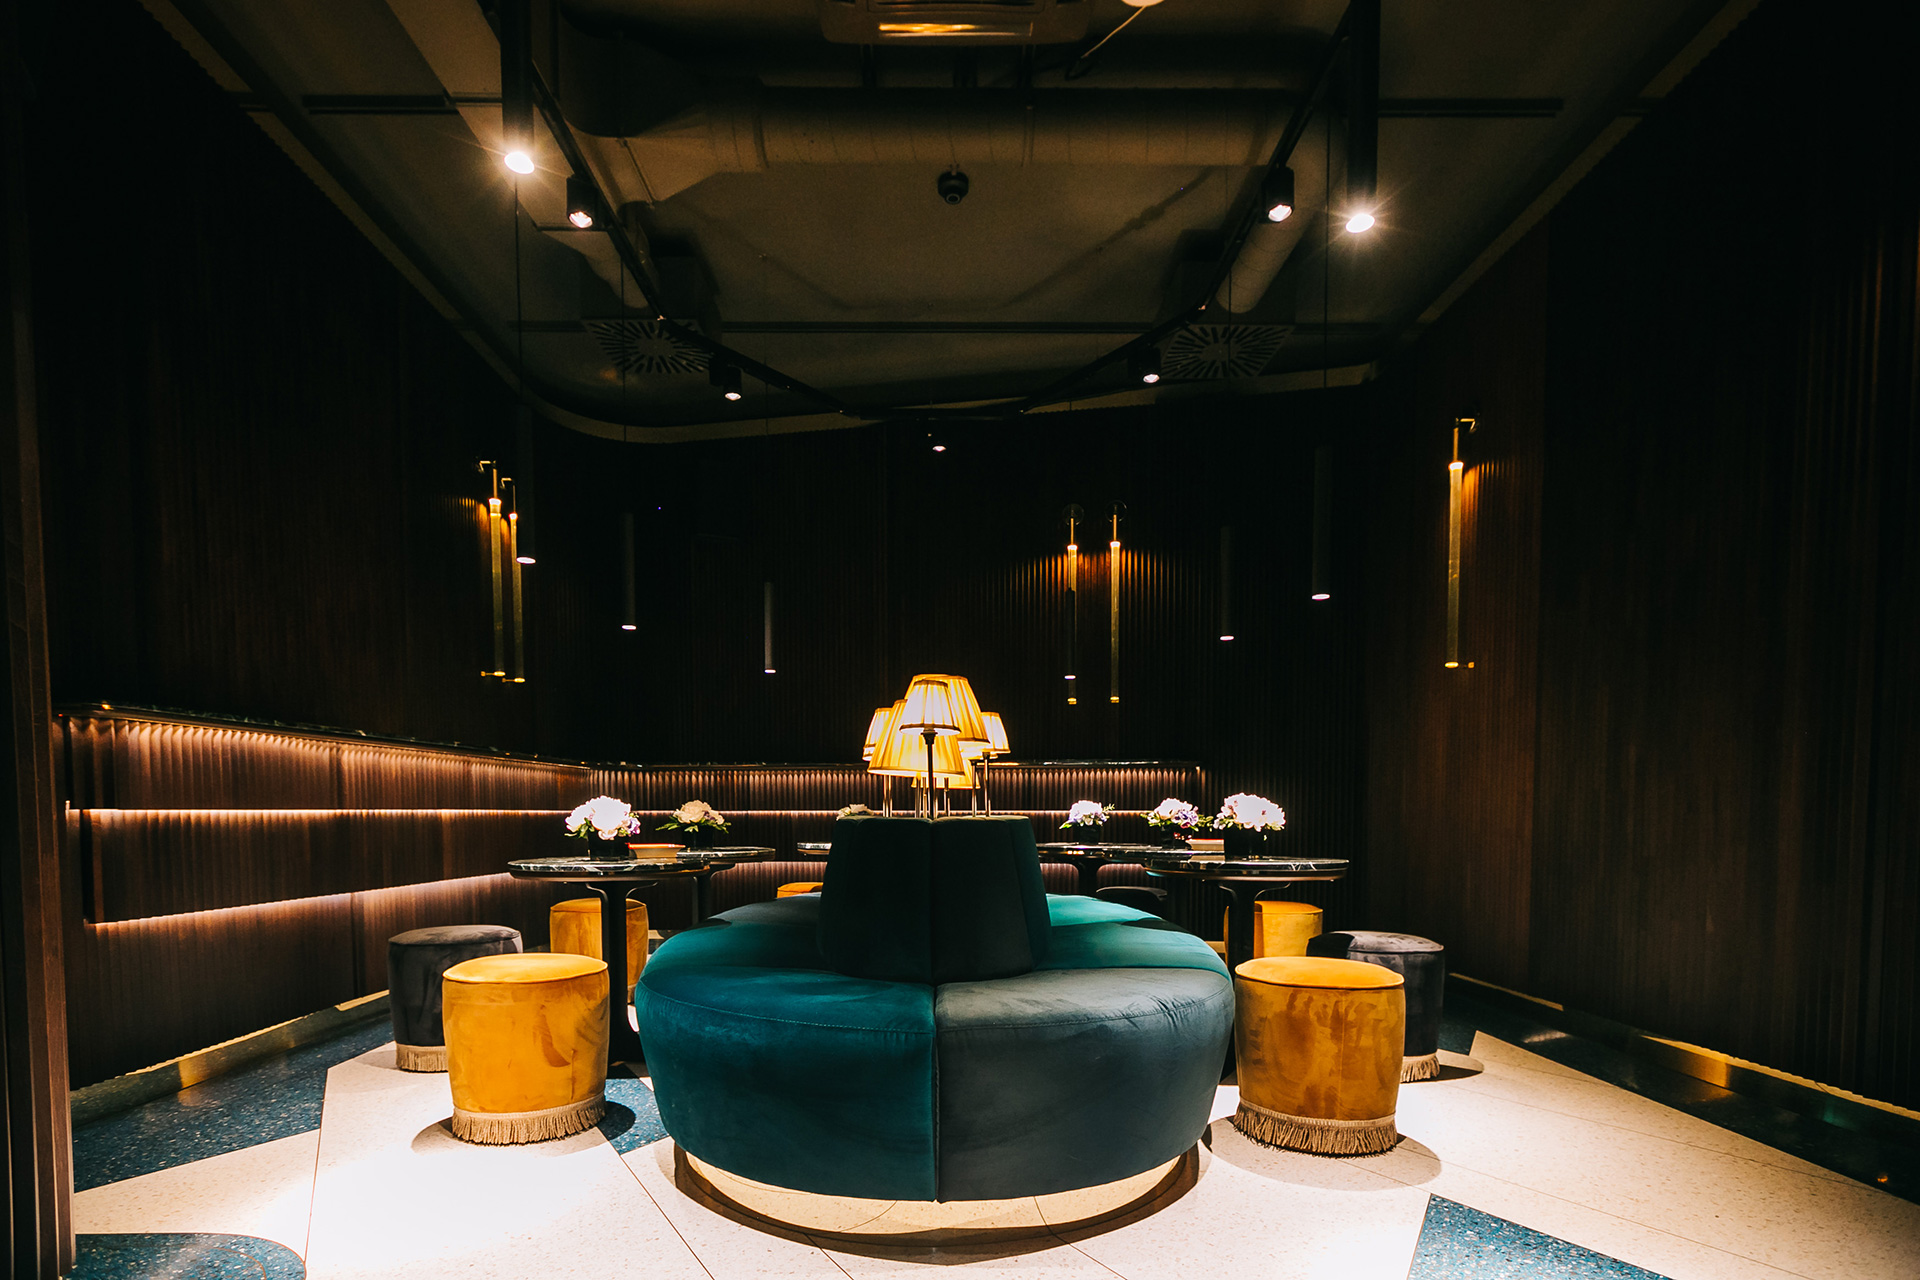 fine-dining-restaurant-interior-tables-seats-taborets